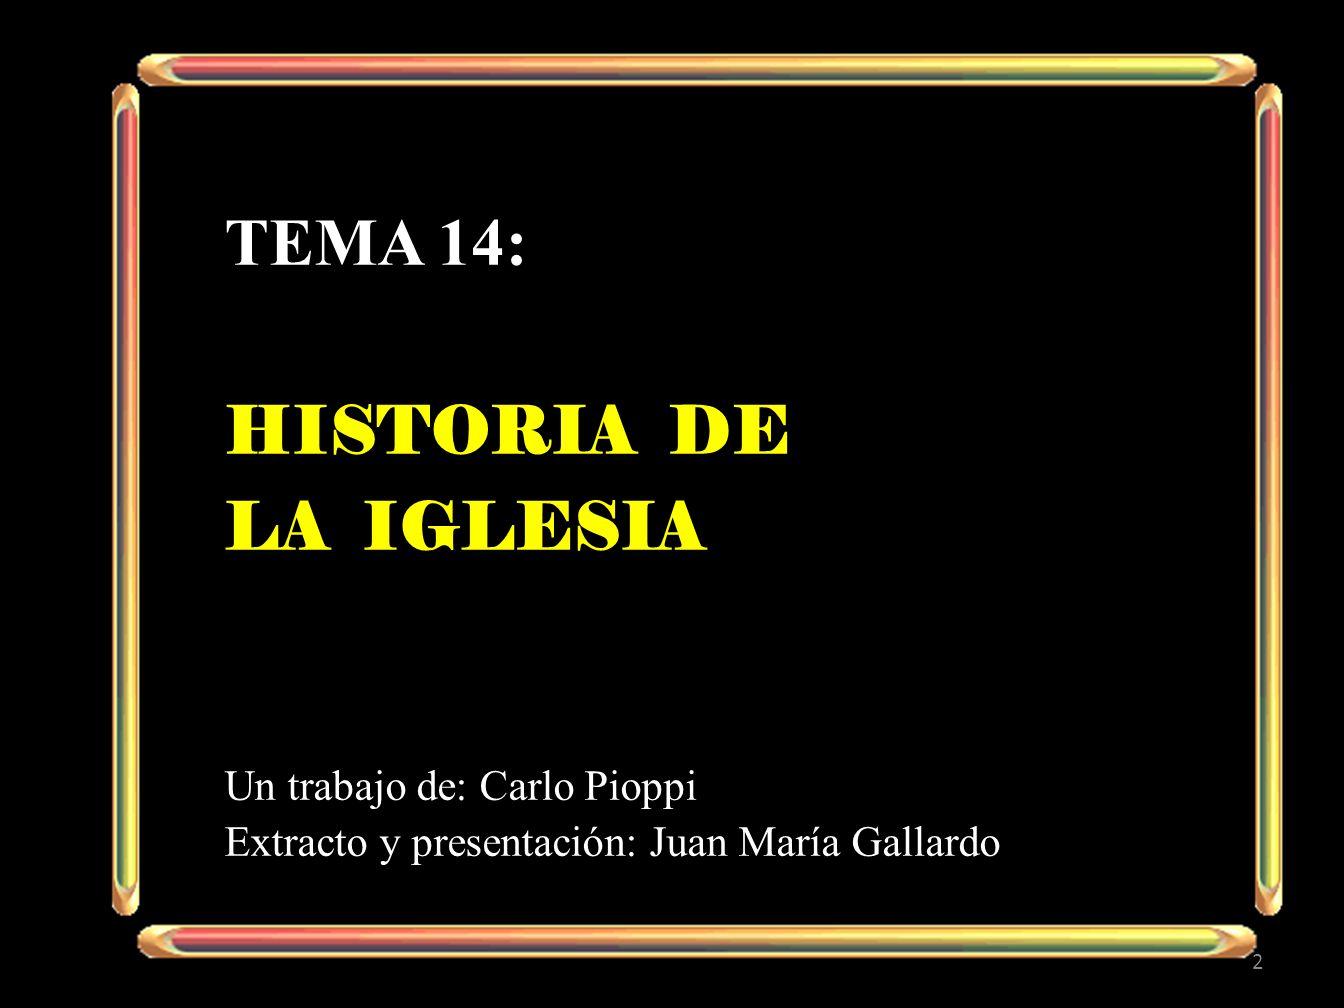 tema 14: Historia De La iglesia Un trabajo de: Carlo Pioppi